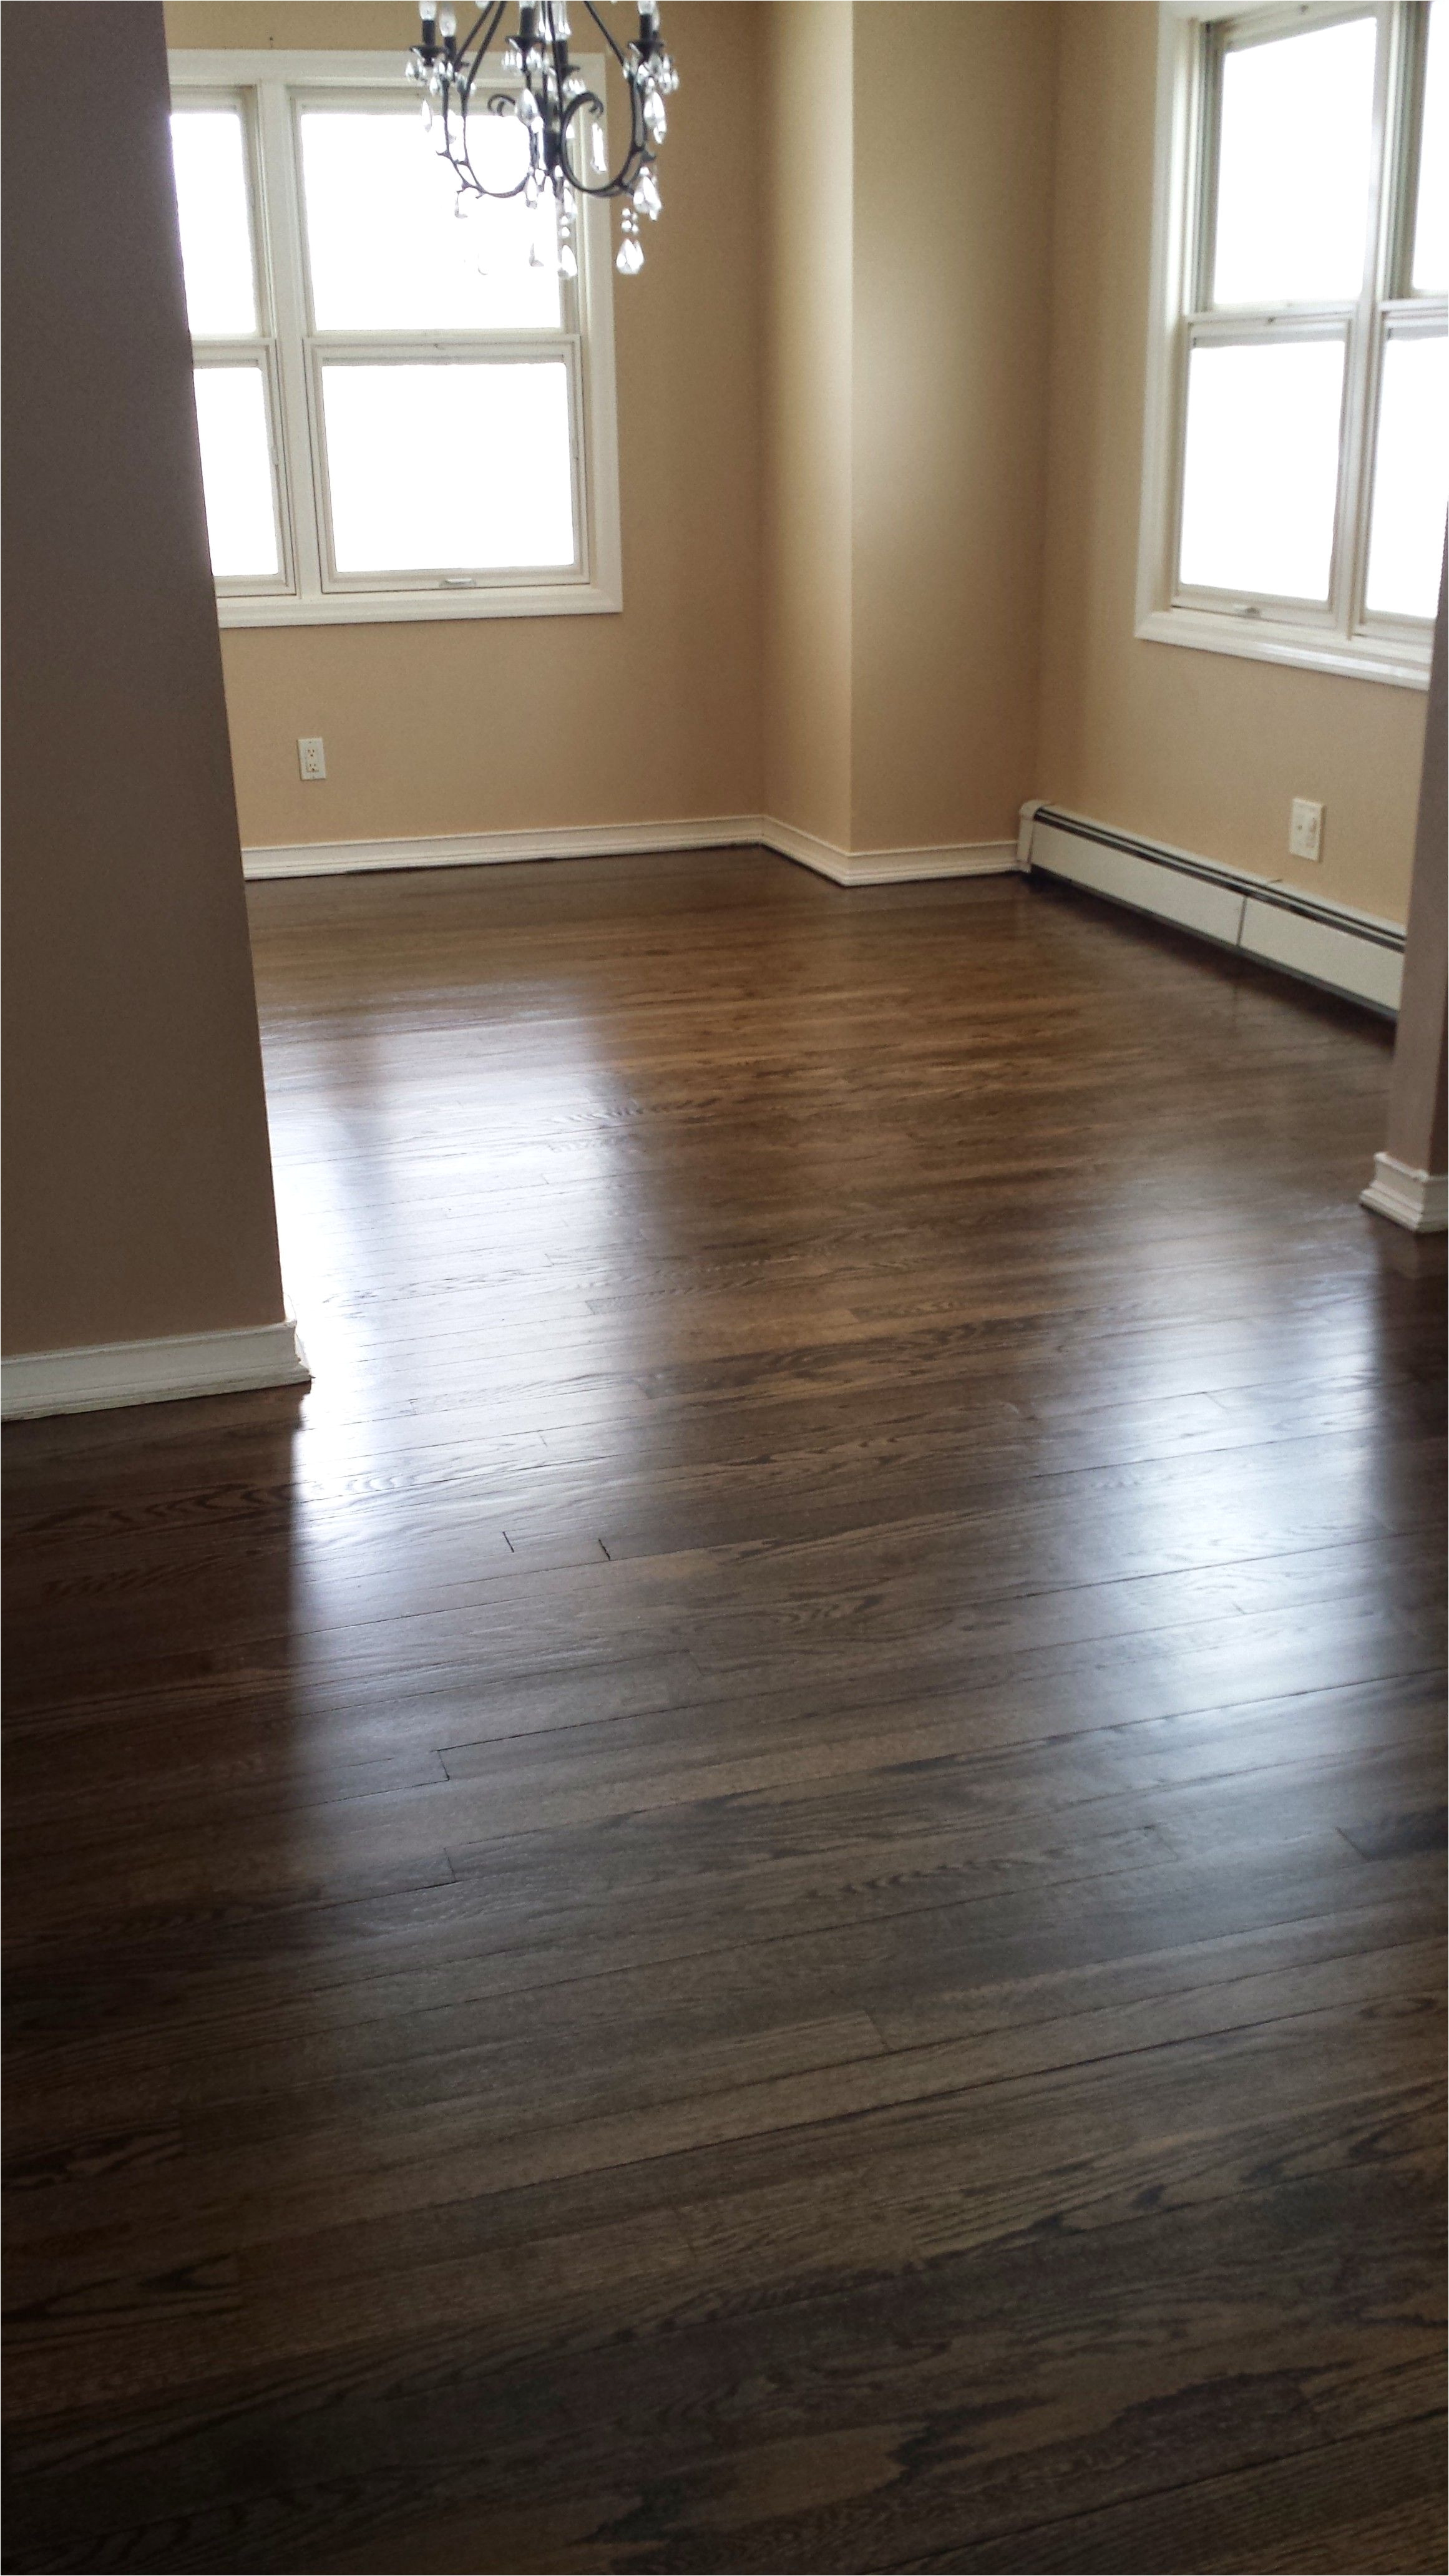 diy hardwood floor installation of refinish hardwood floors diy dahuacctvth com for refinish hardwood floors diy